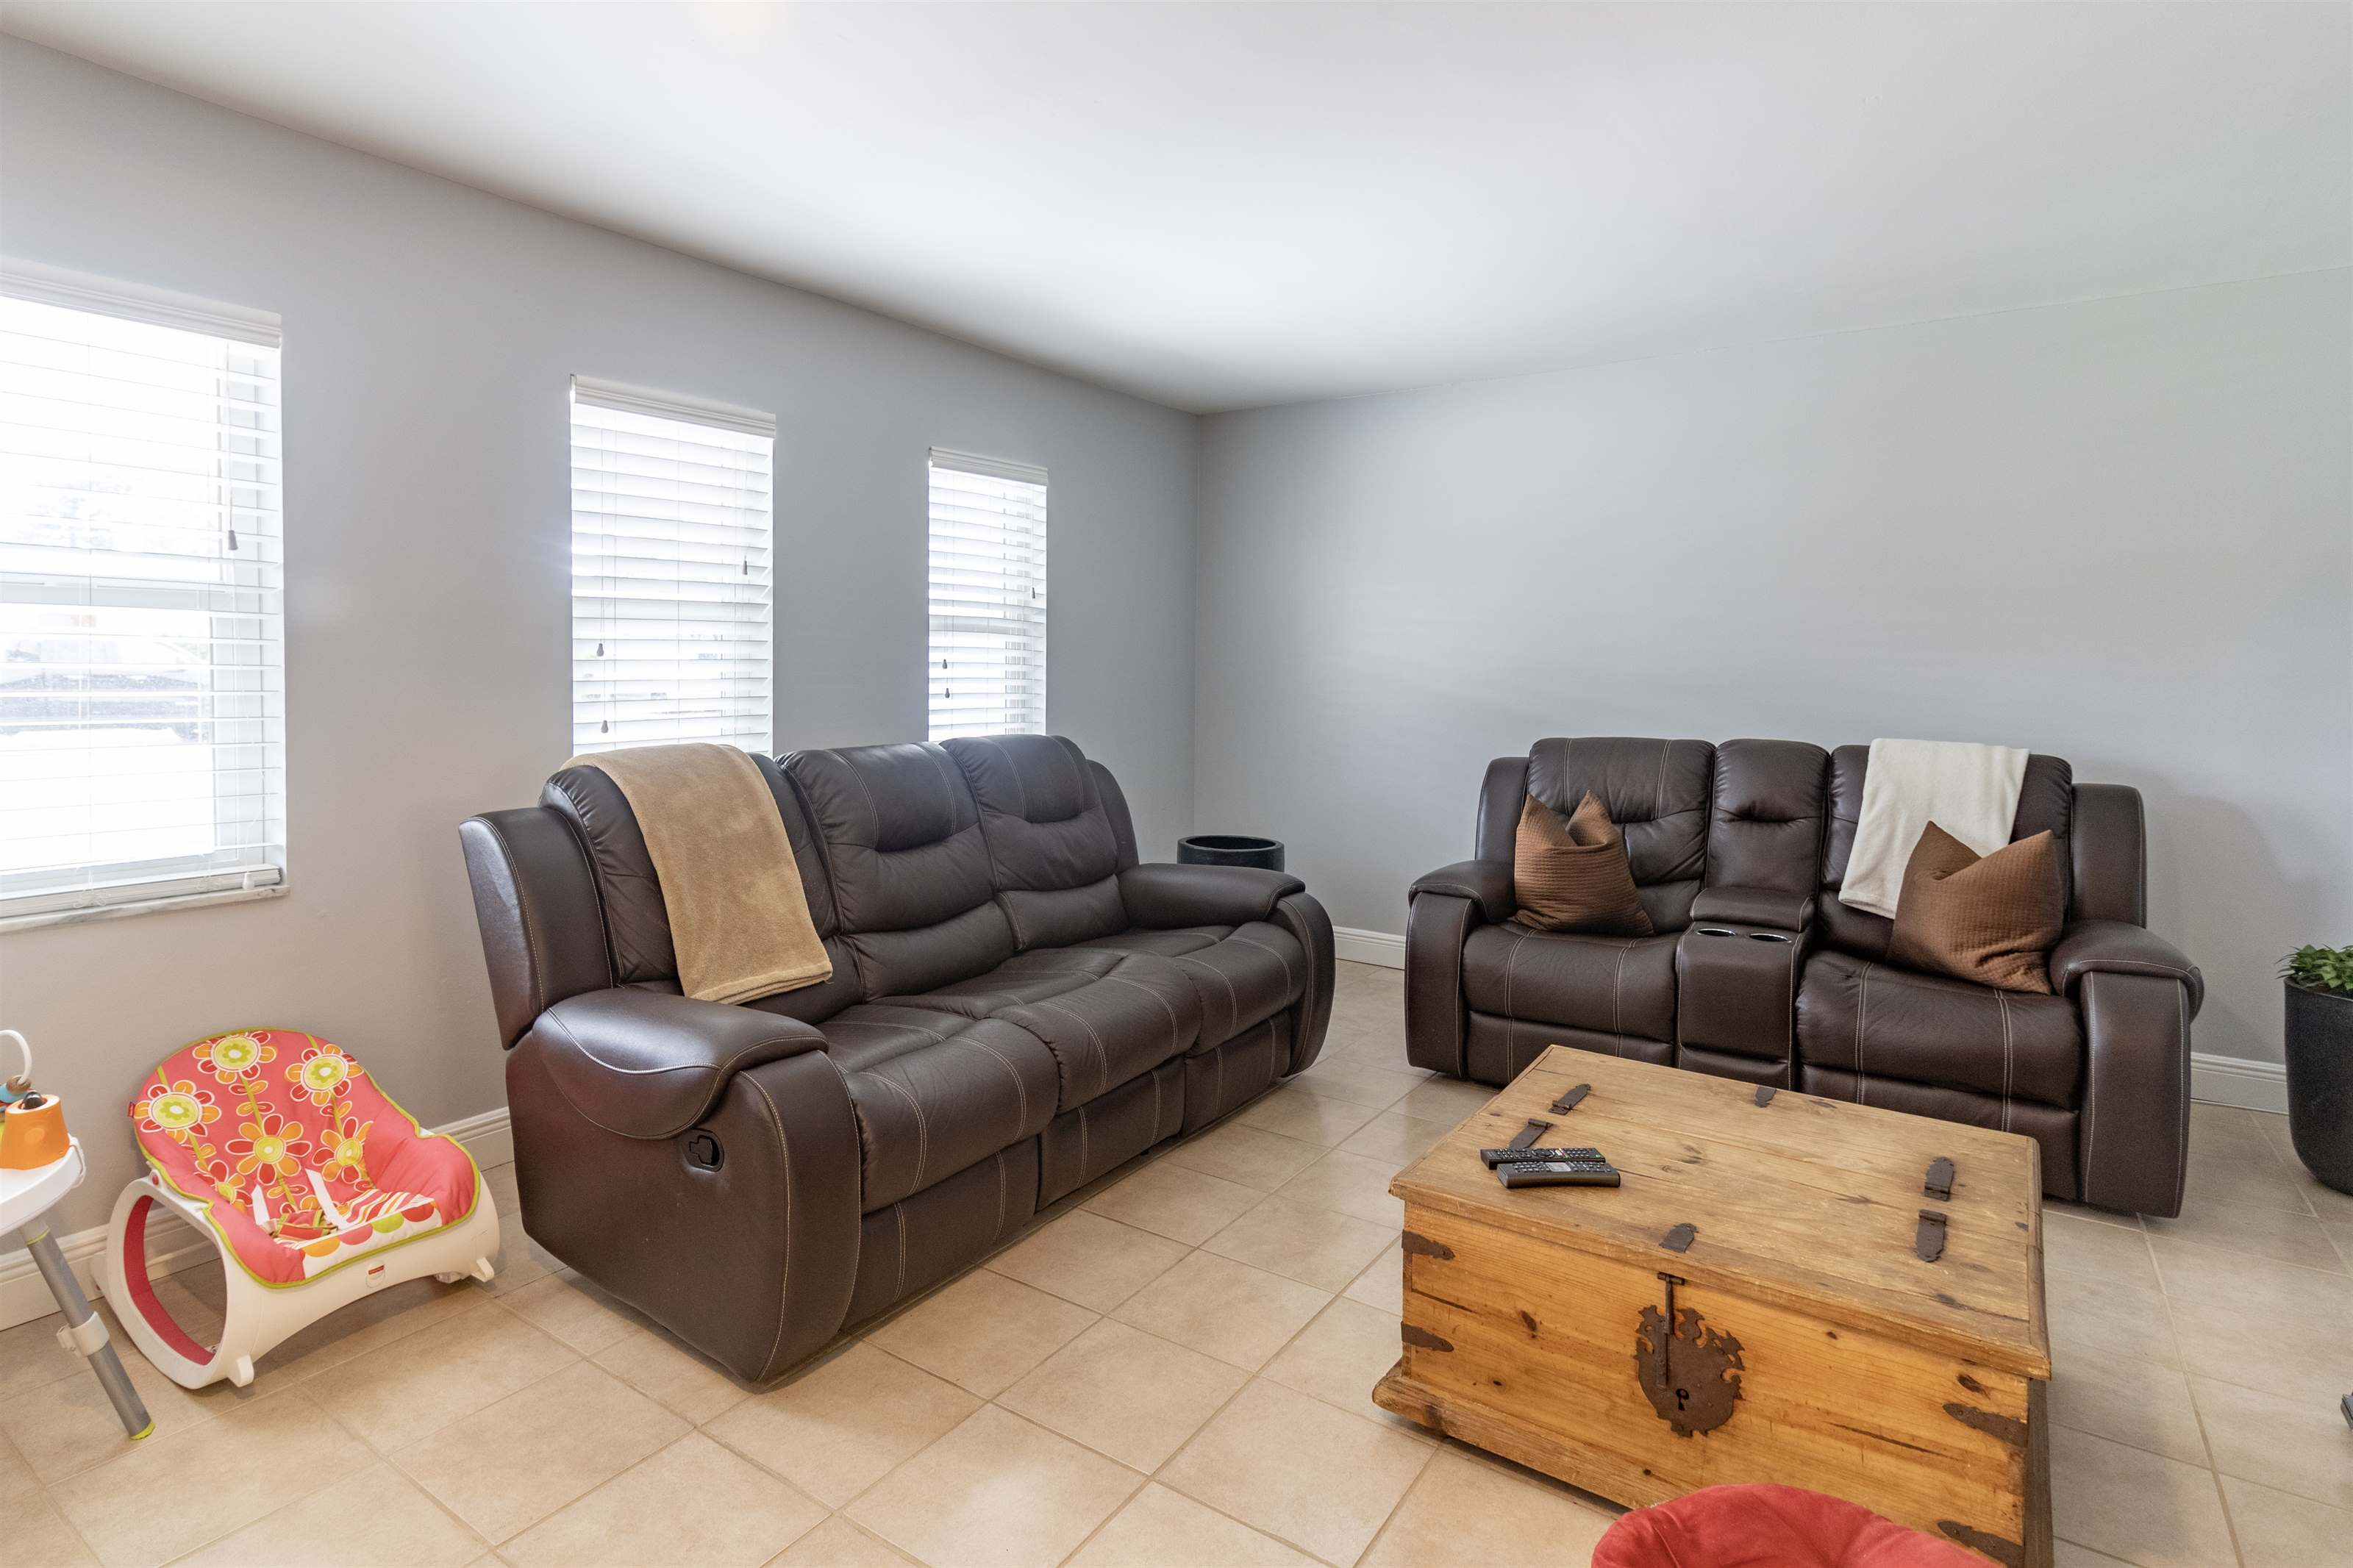 3593 Kitely Ave, Boynton Beach, FL 33436